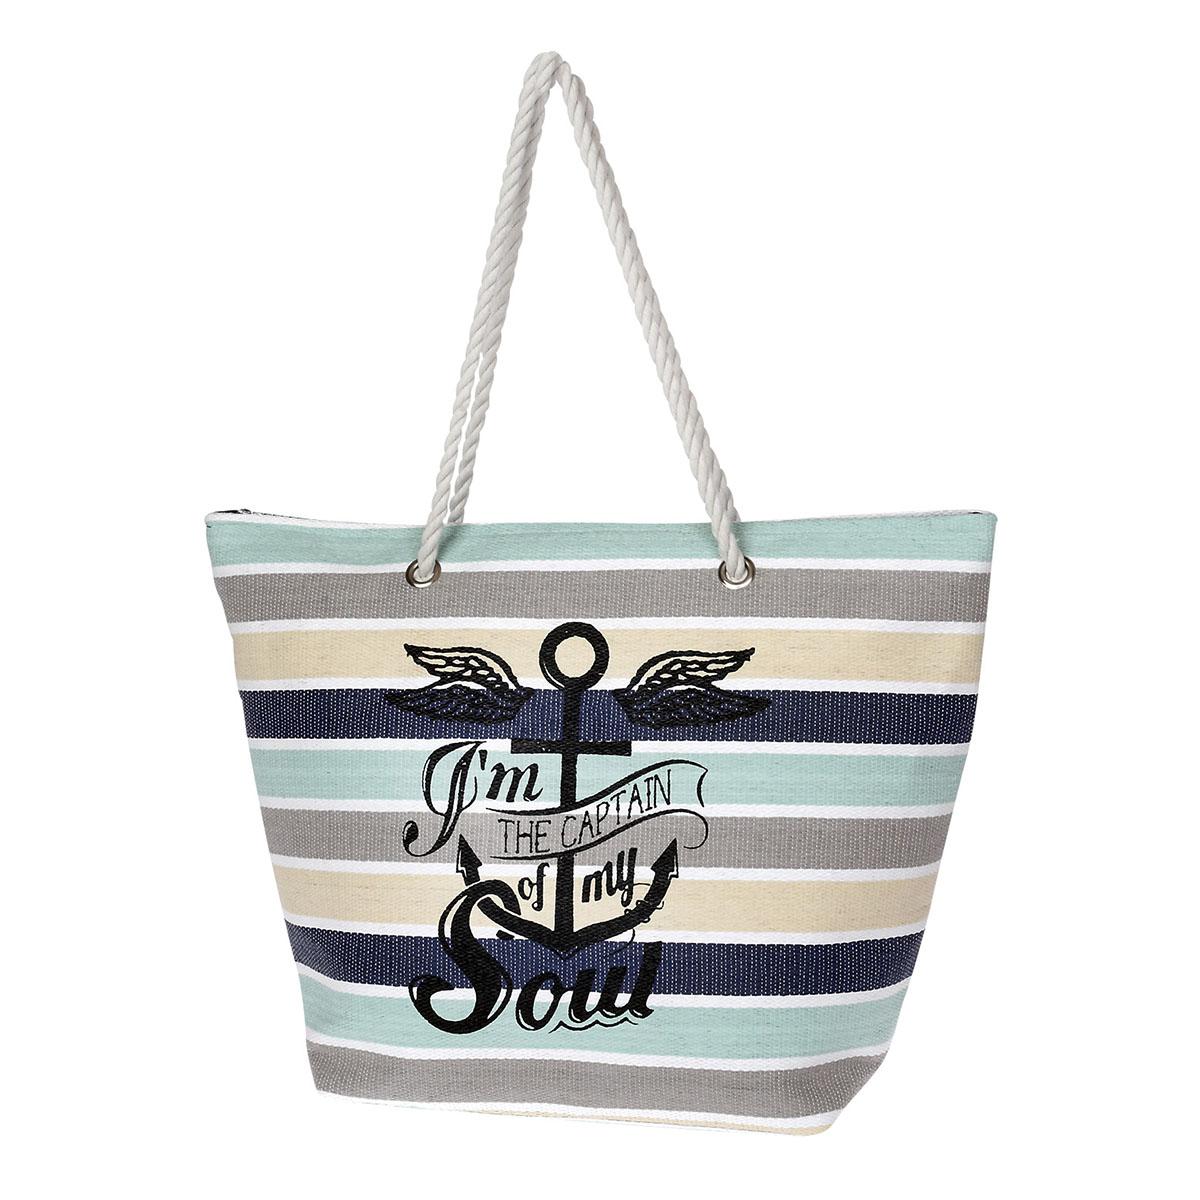 e170988647 Τσάντα Ώμου-Θαλάσσης Με Άγκυρα Seagull Diplomat SUN150 Πολύχρωμη ...